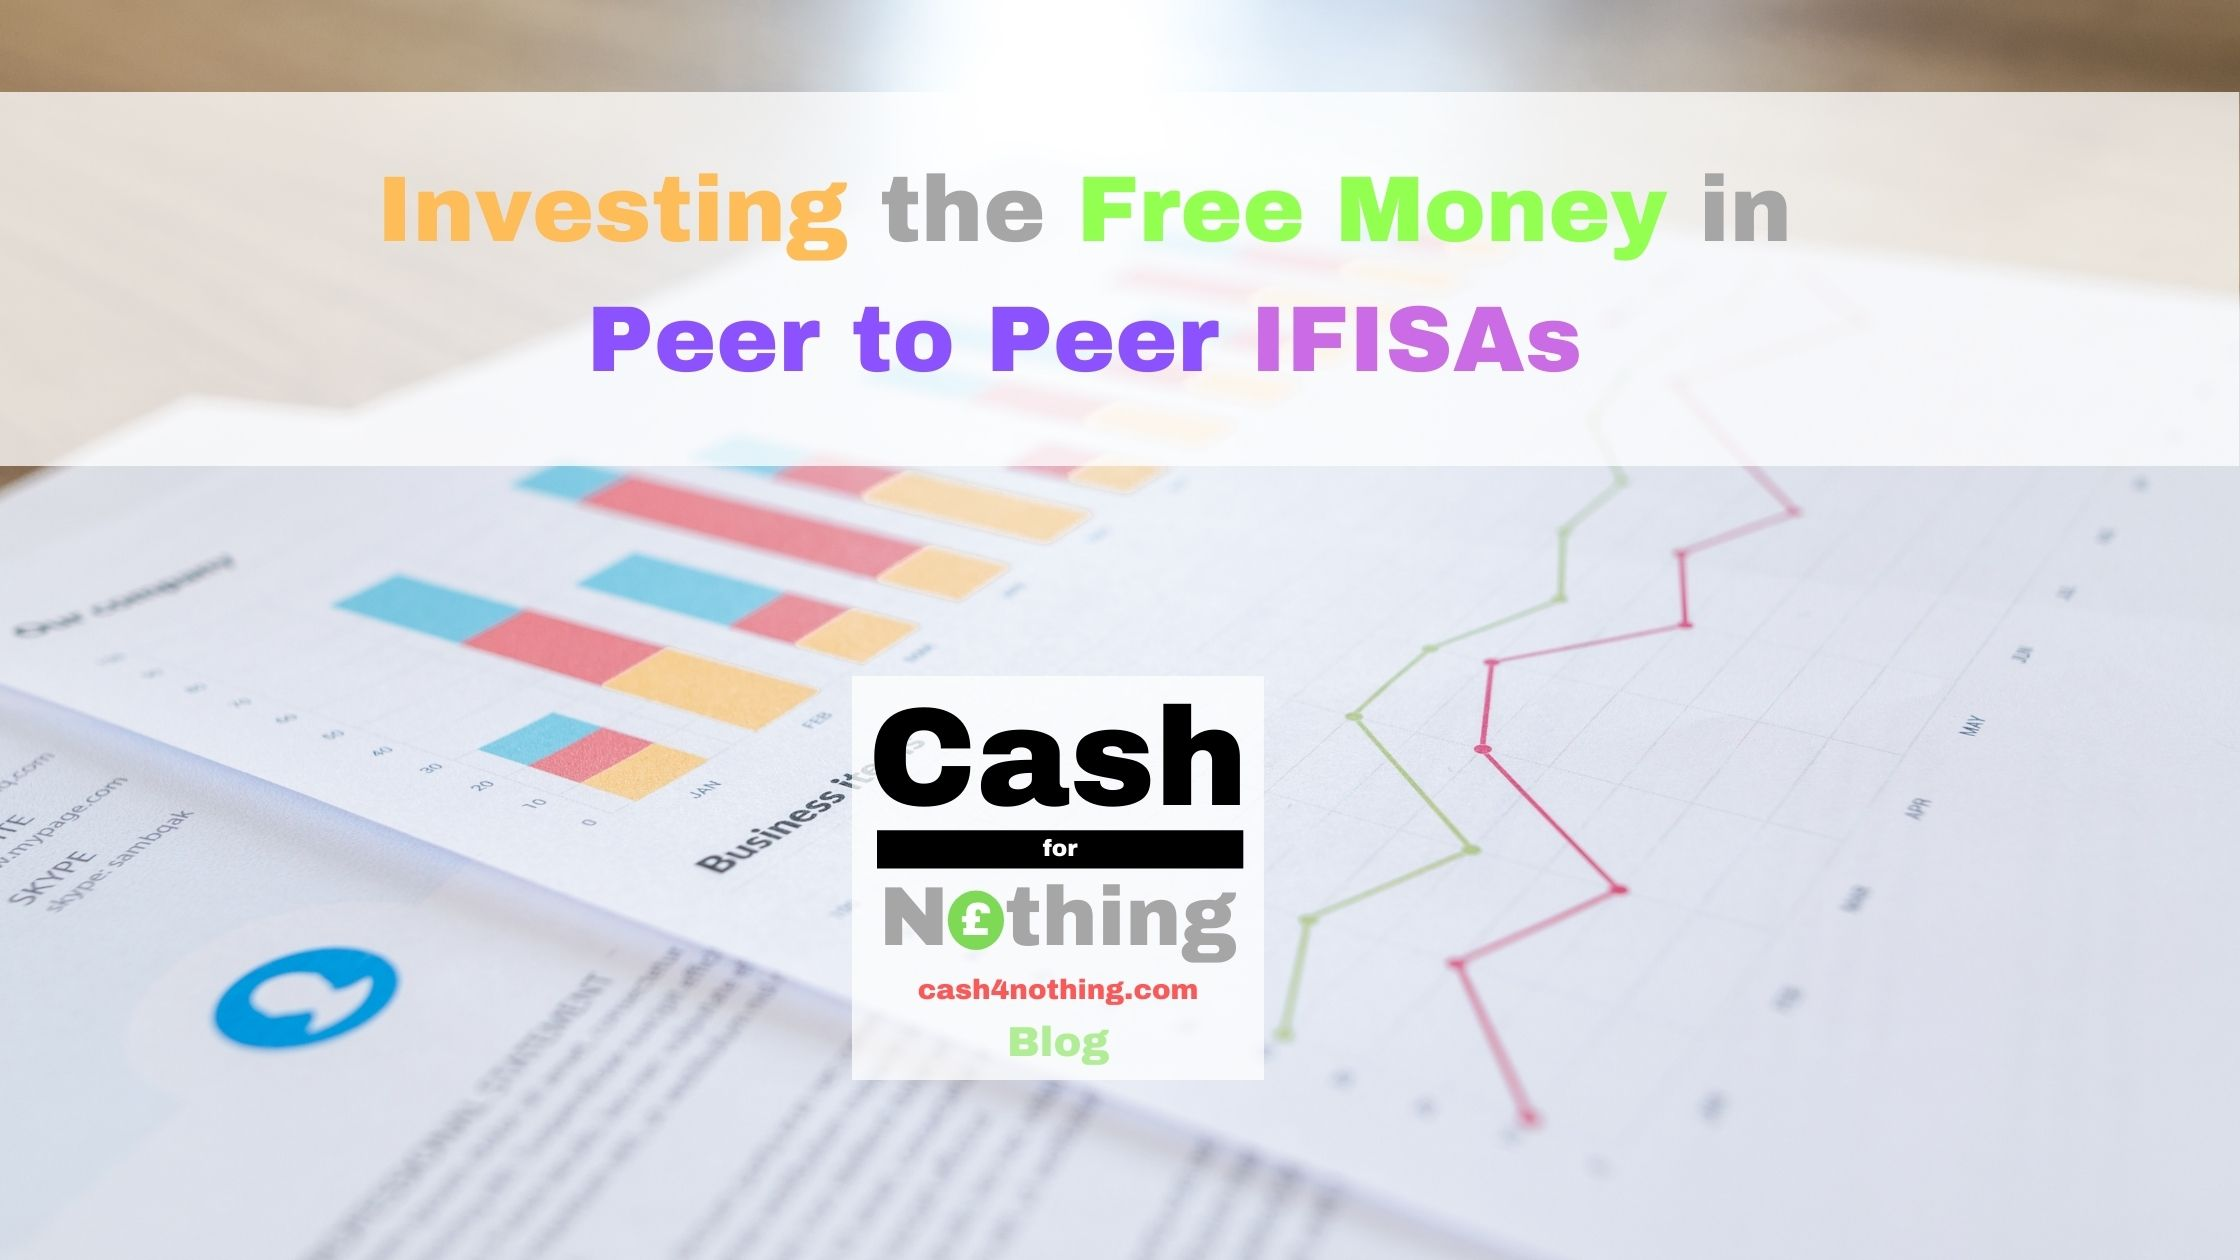 cash4nothing.com